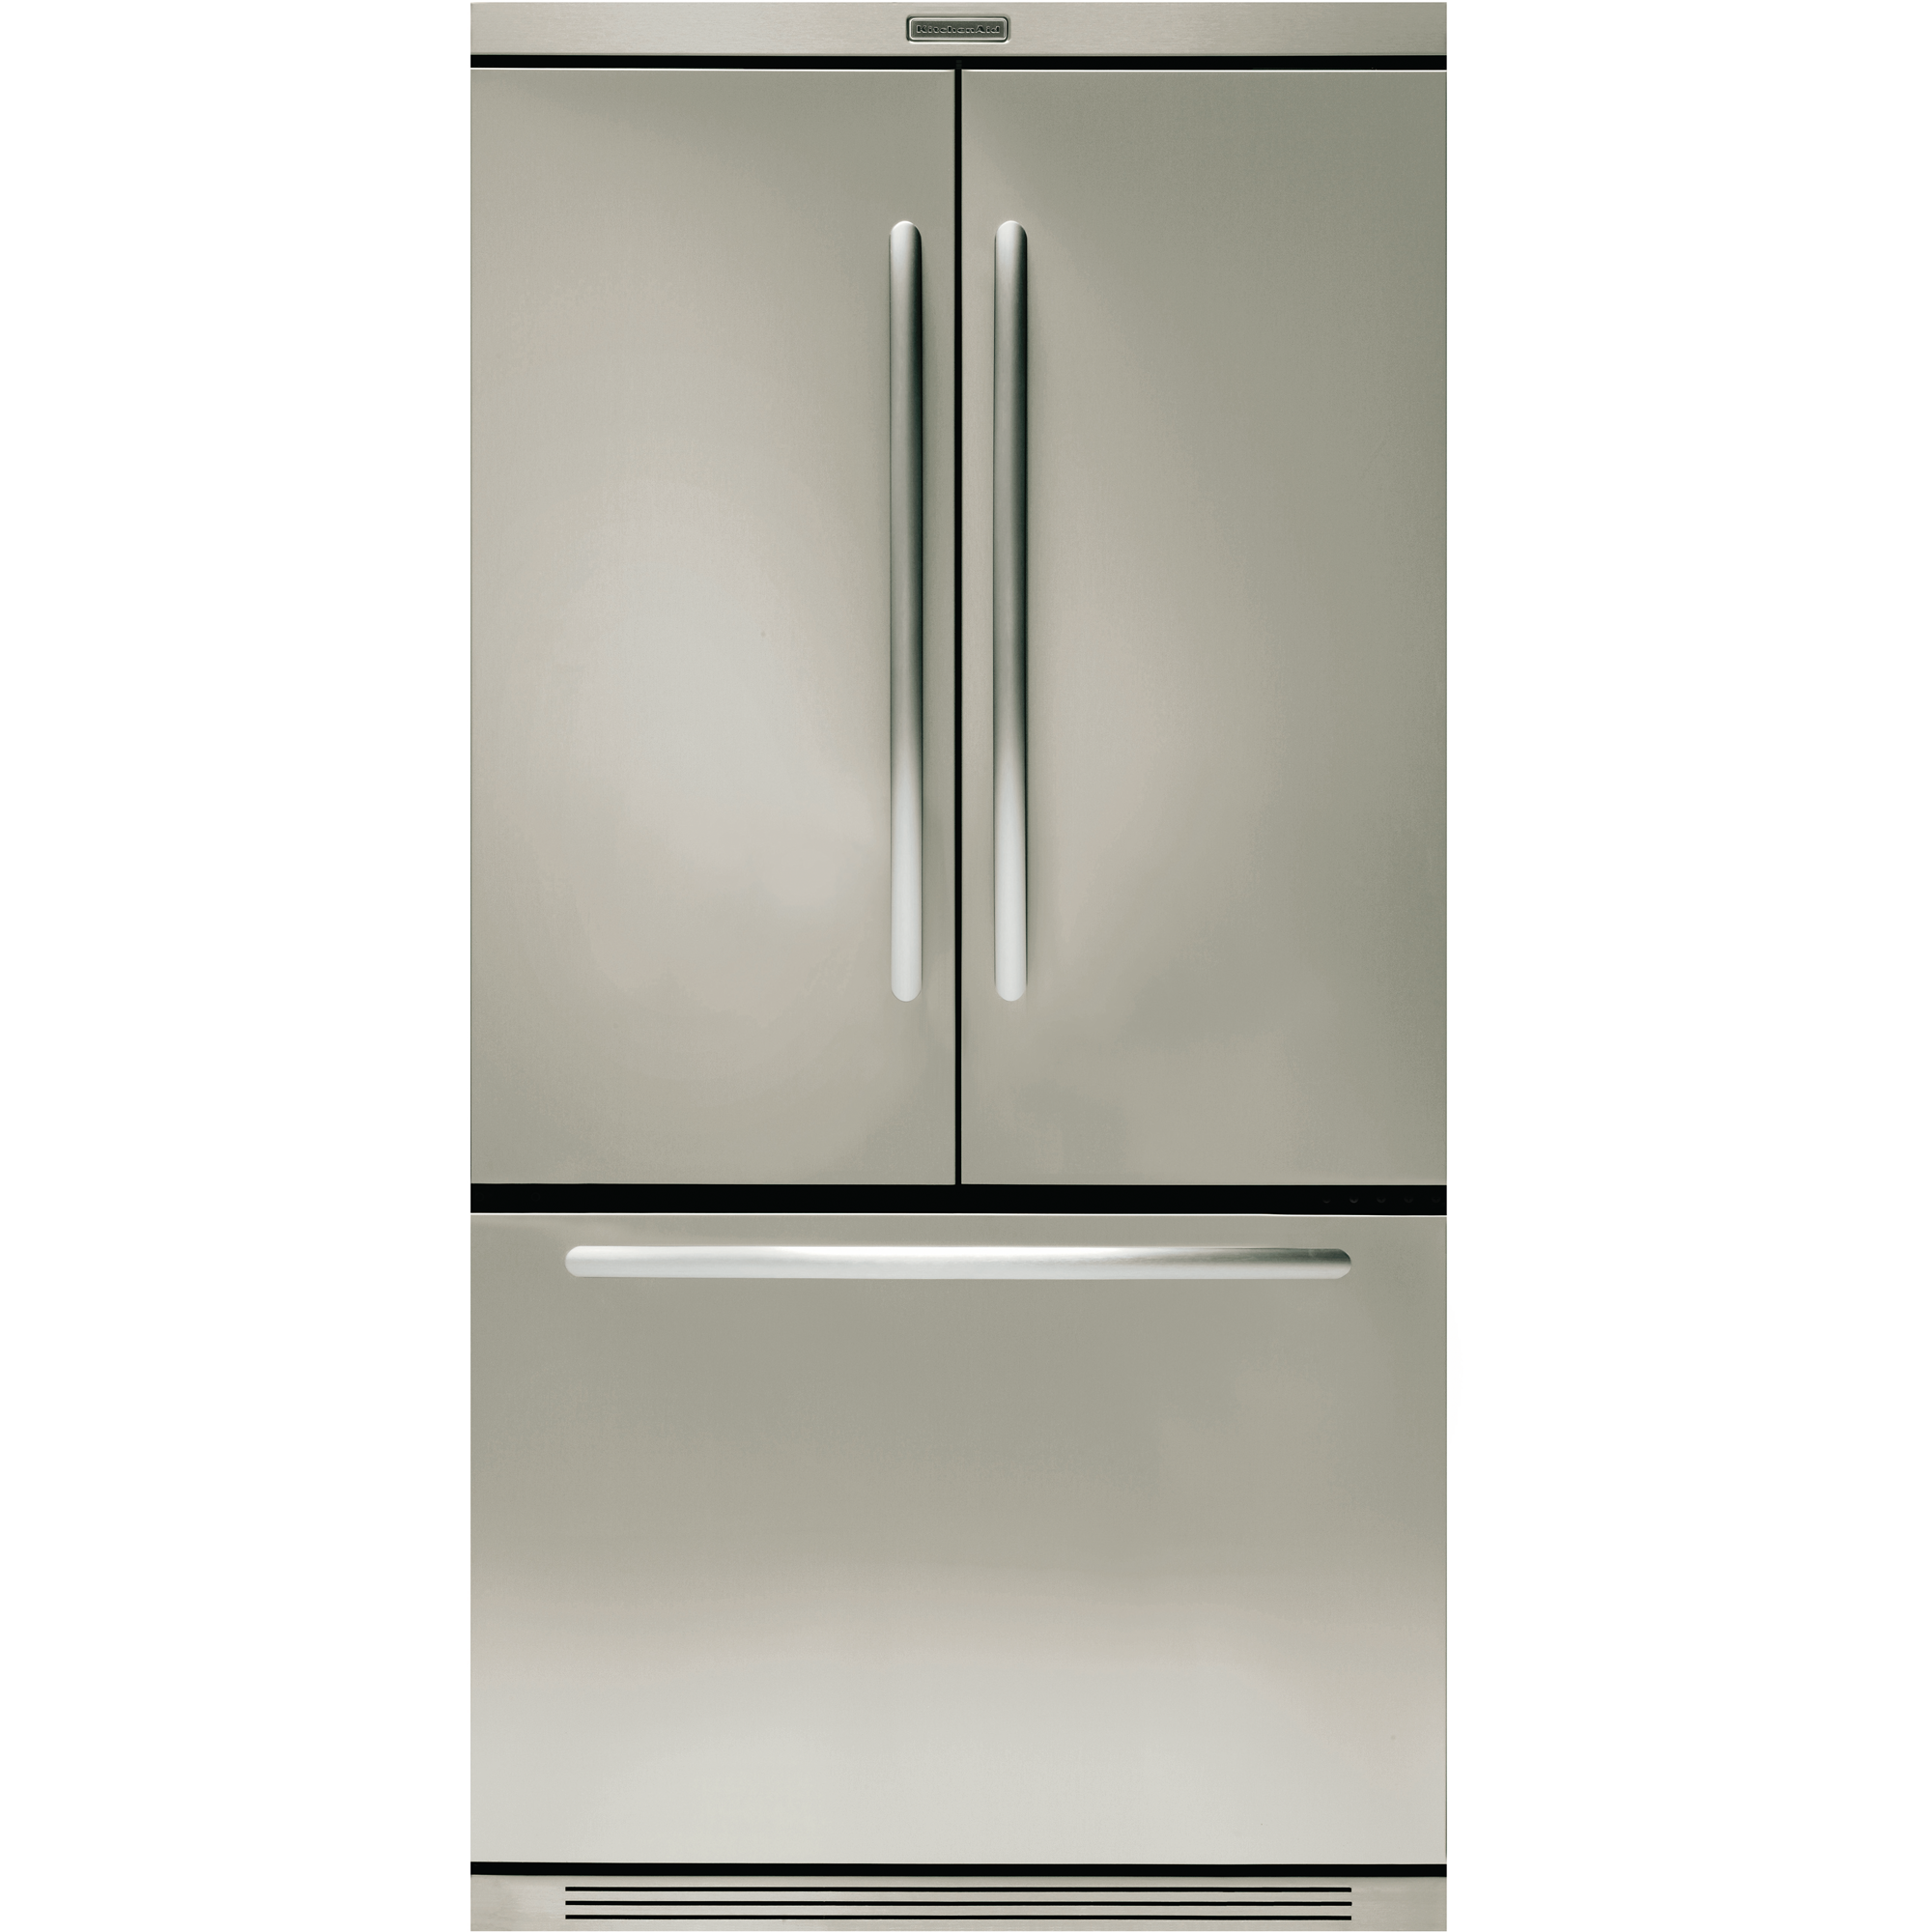 Emejing frigo americain faible profondeur pictures - Meilleur frigo americain ...